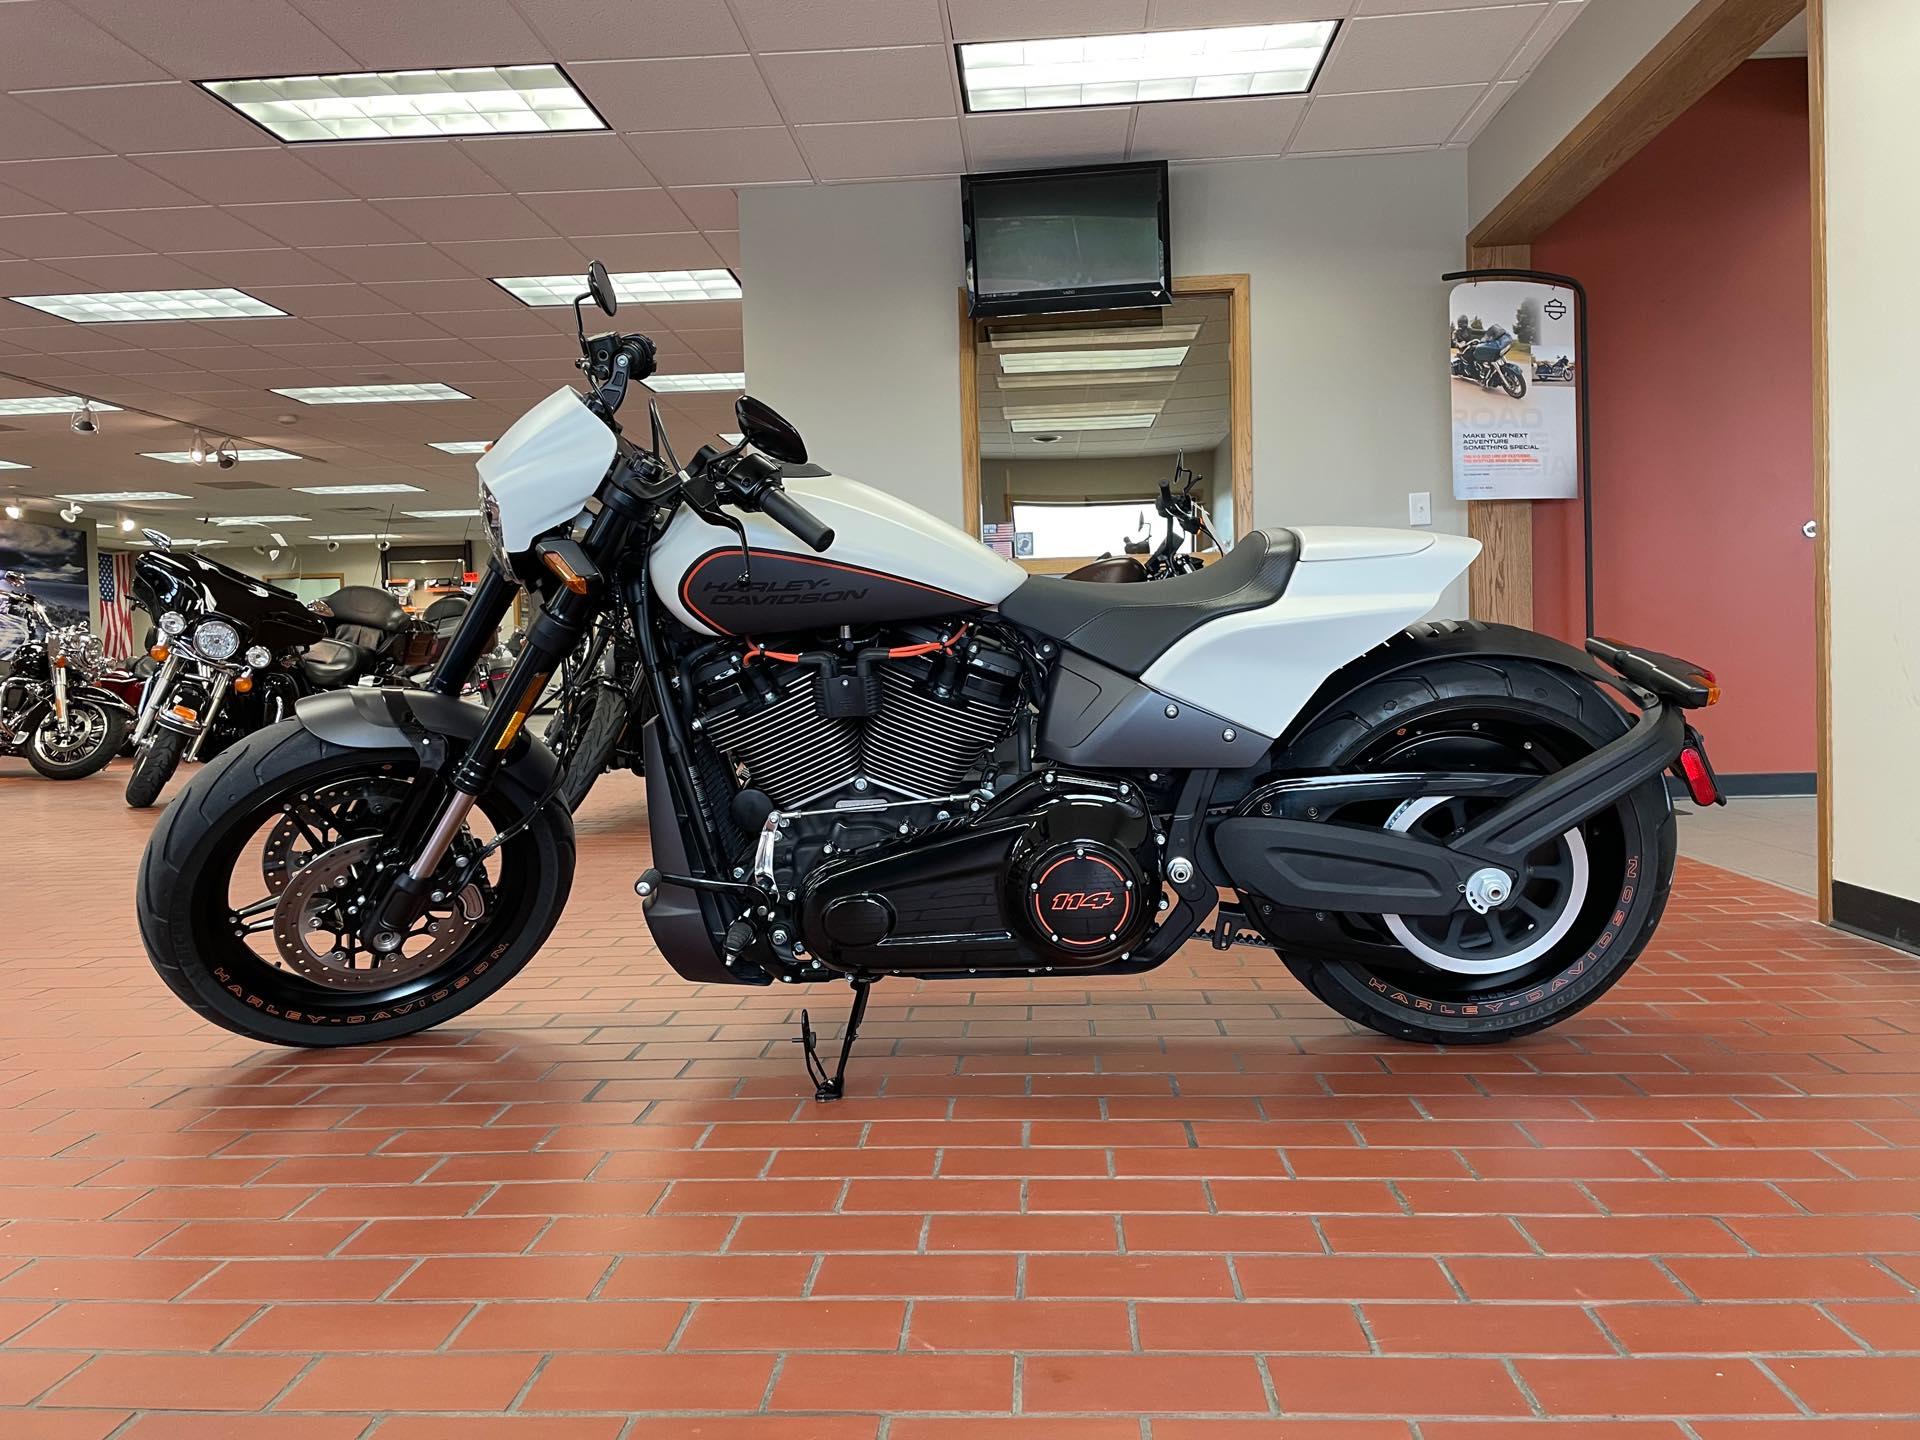 2019 Harley-Davidson Softail FXDR 114 at Rooster's Harley Davidson